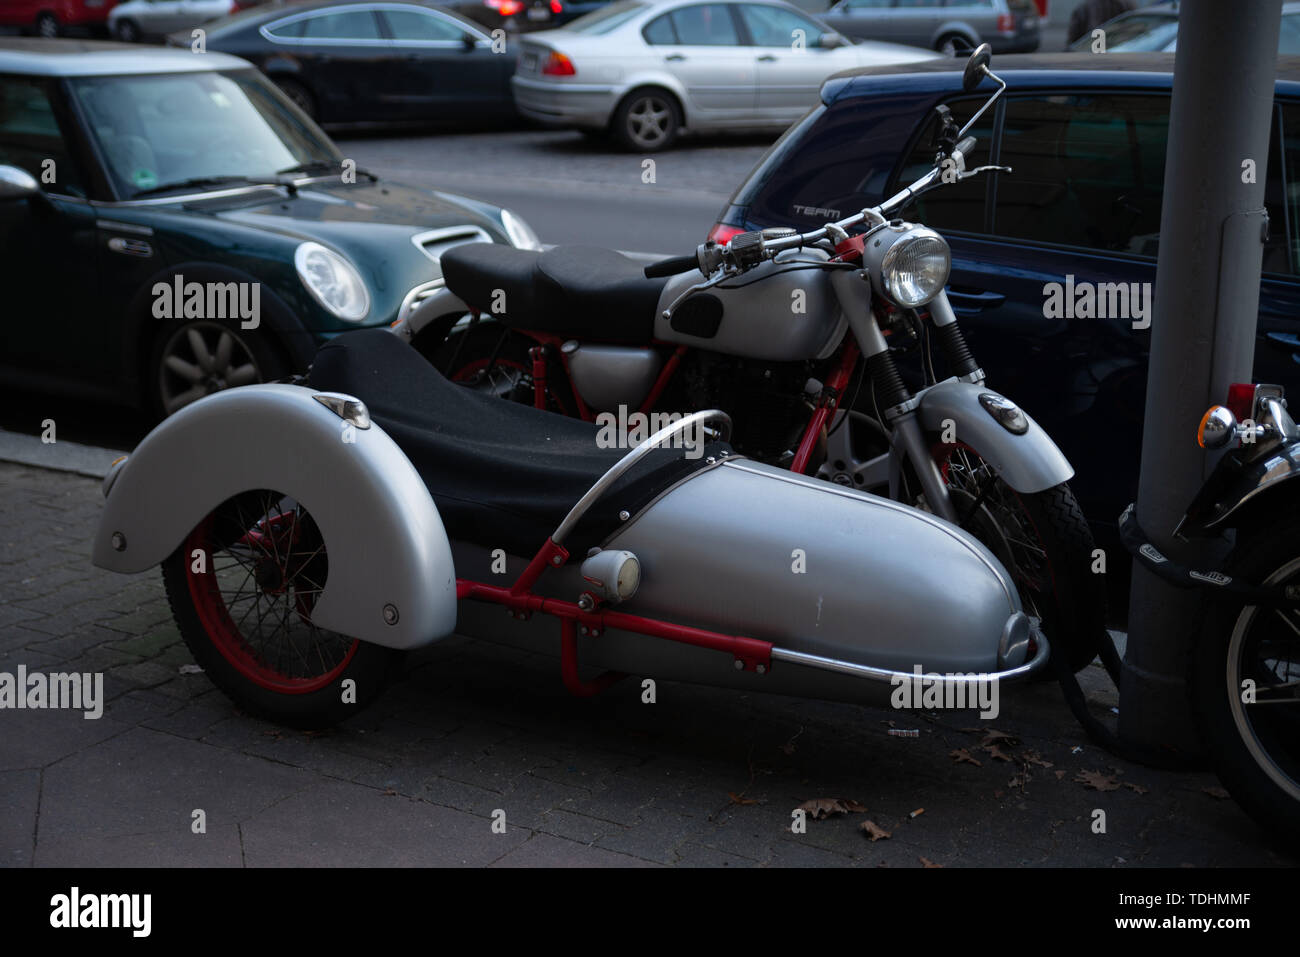 Bmw Motorcycle Sidecar Stock Photos & Bmw Motorcycle Sidecar